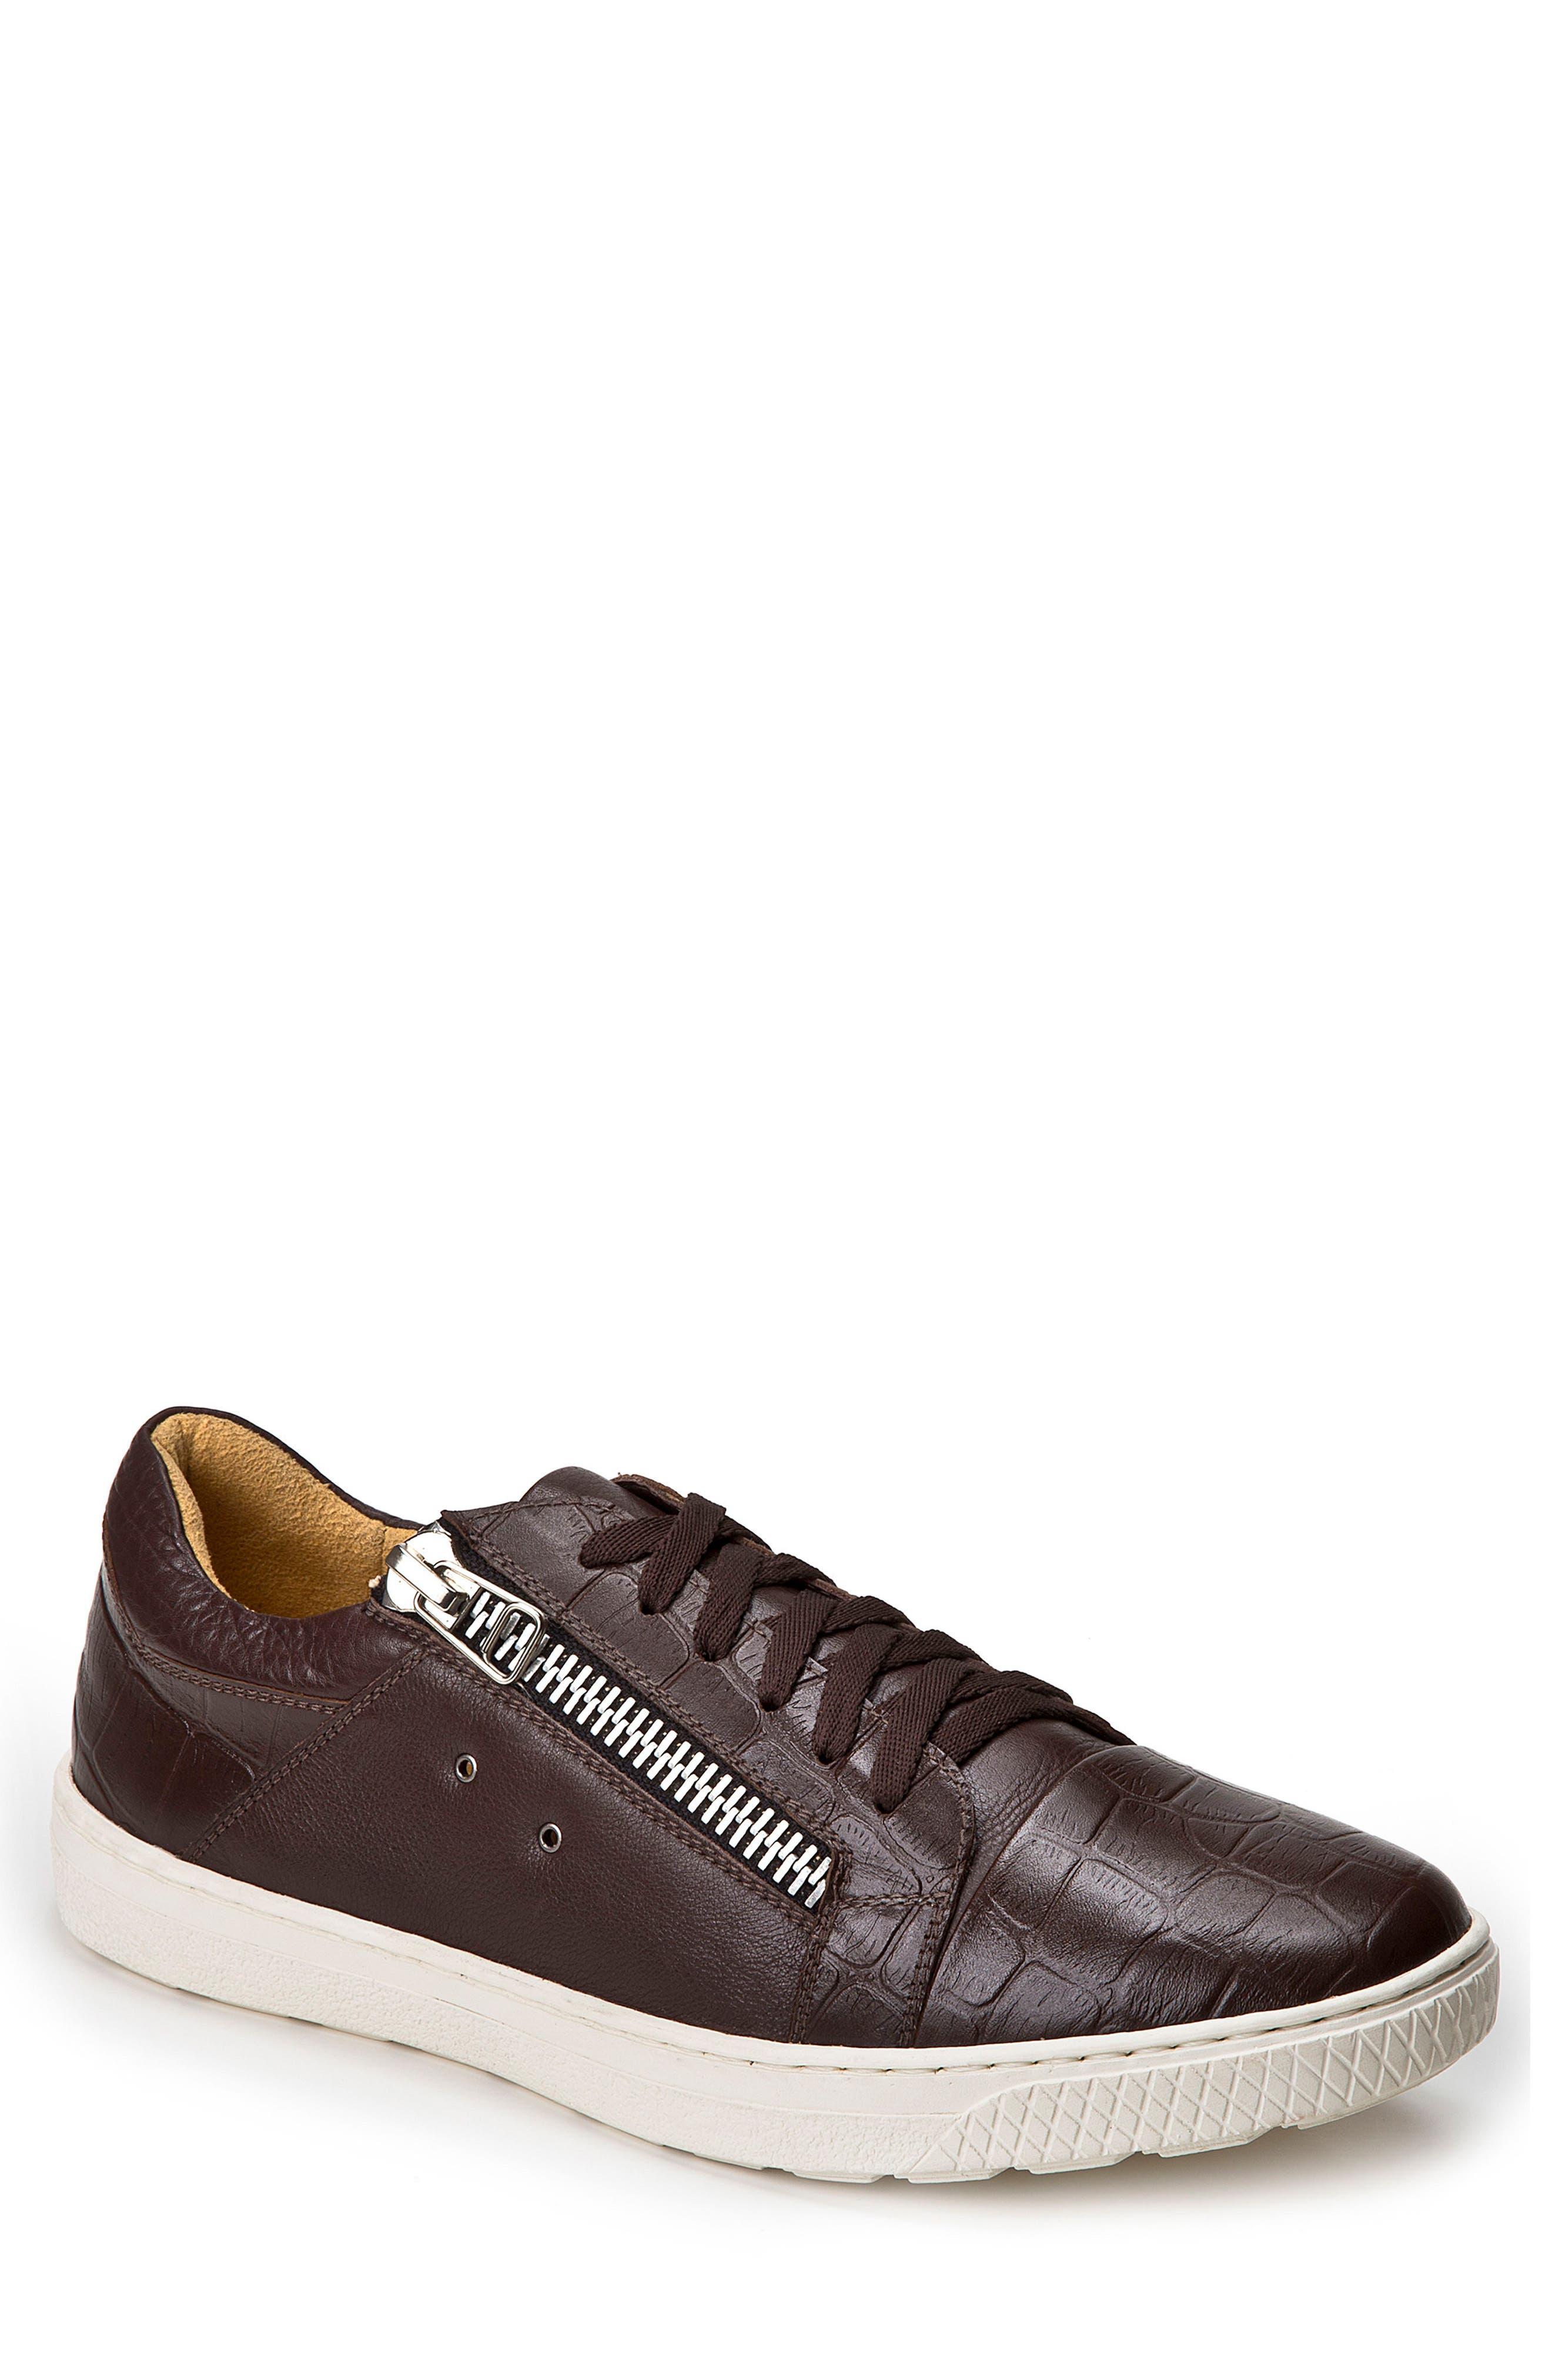 Alternate Image 1 Selected - Sandro Moscoloni Cassius Side Zip Sneaker (Men)